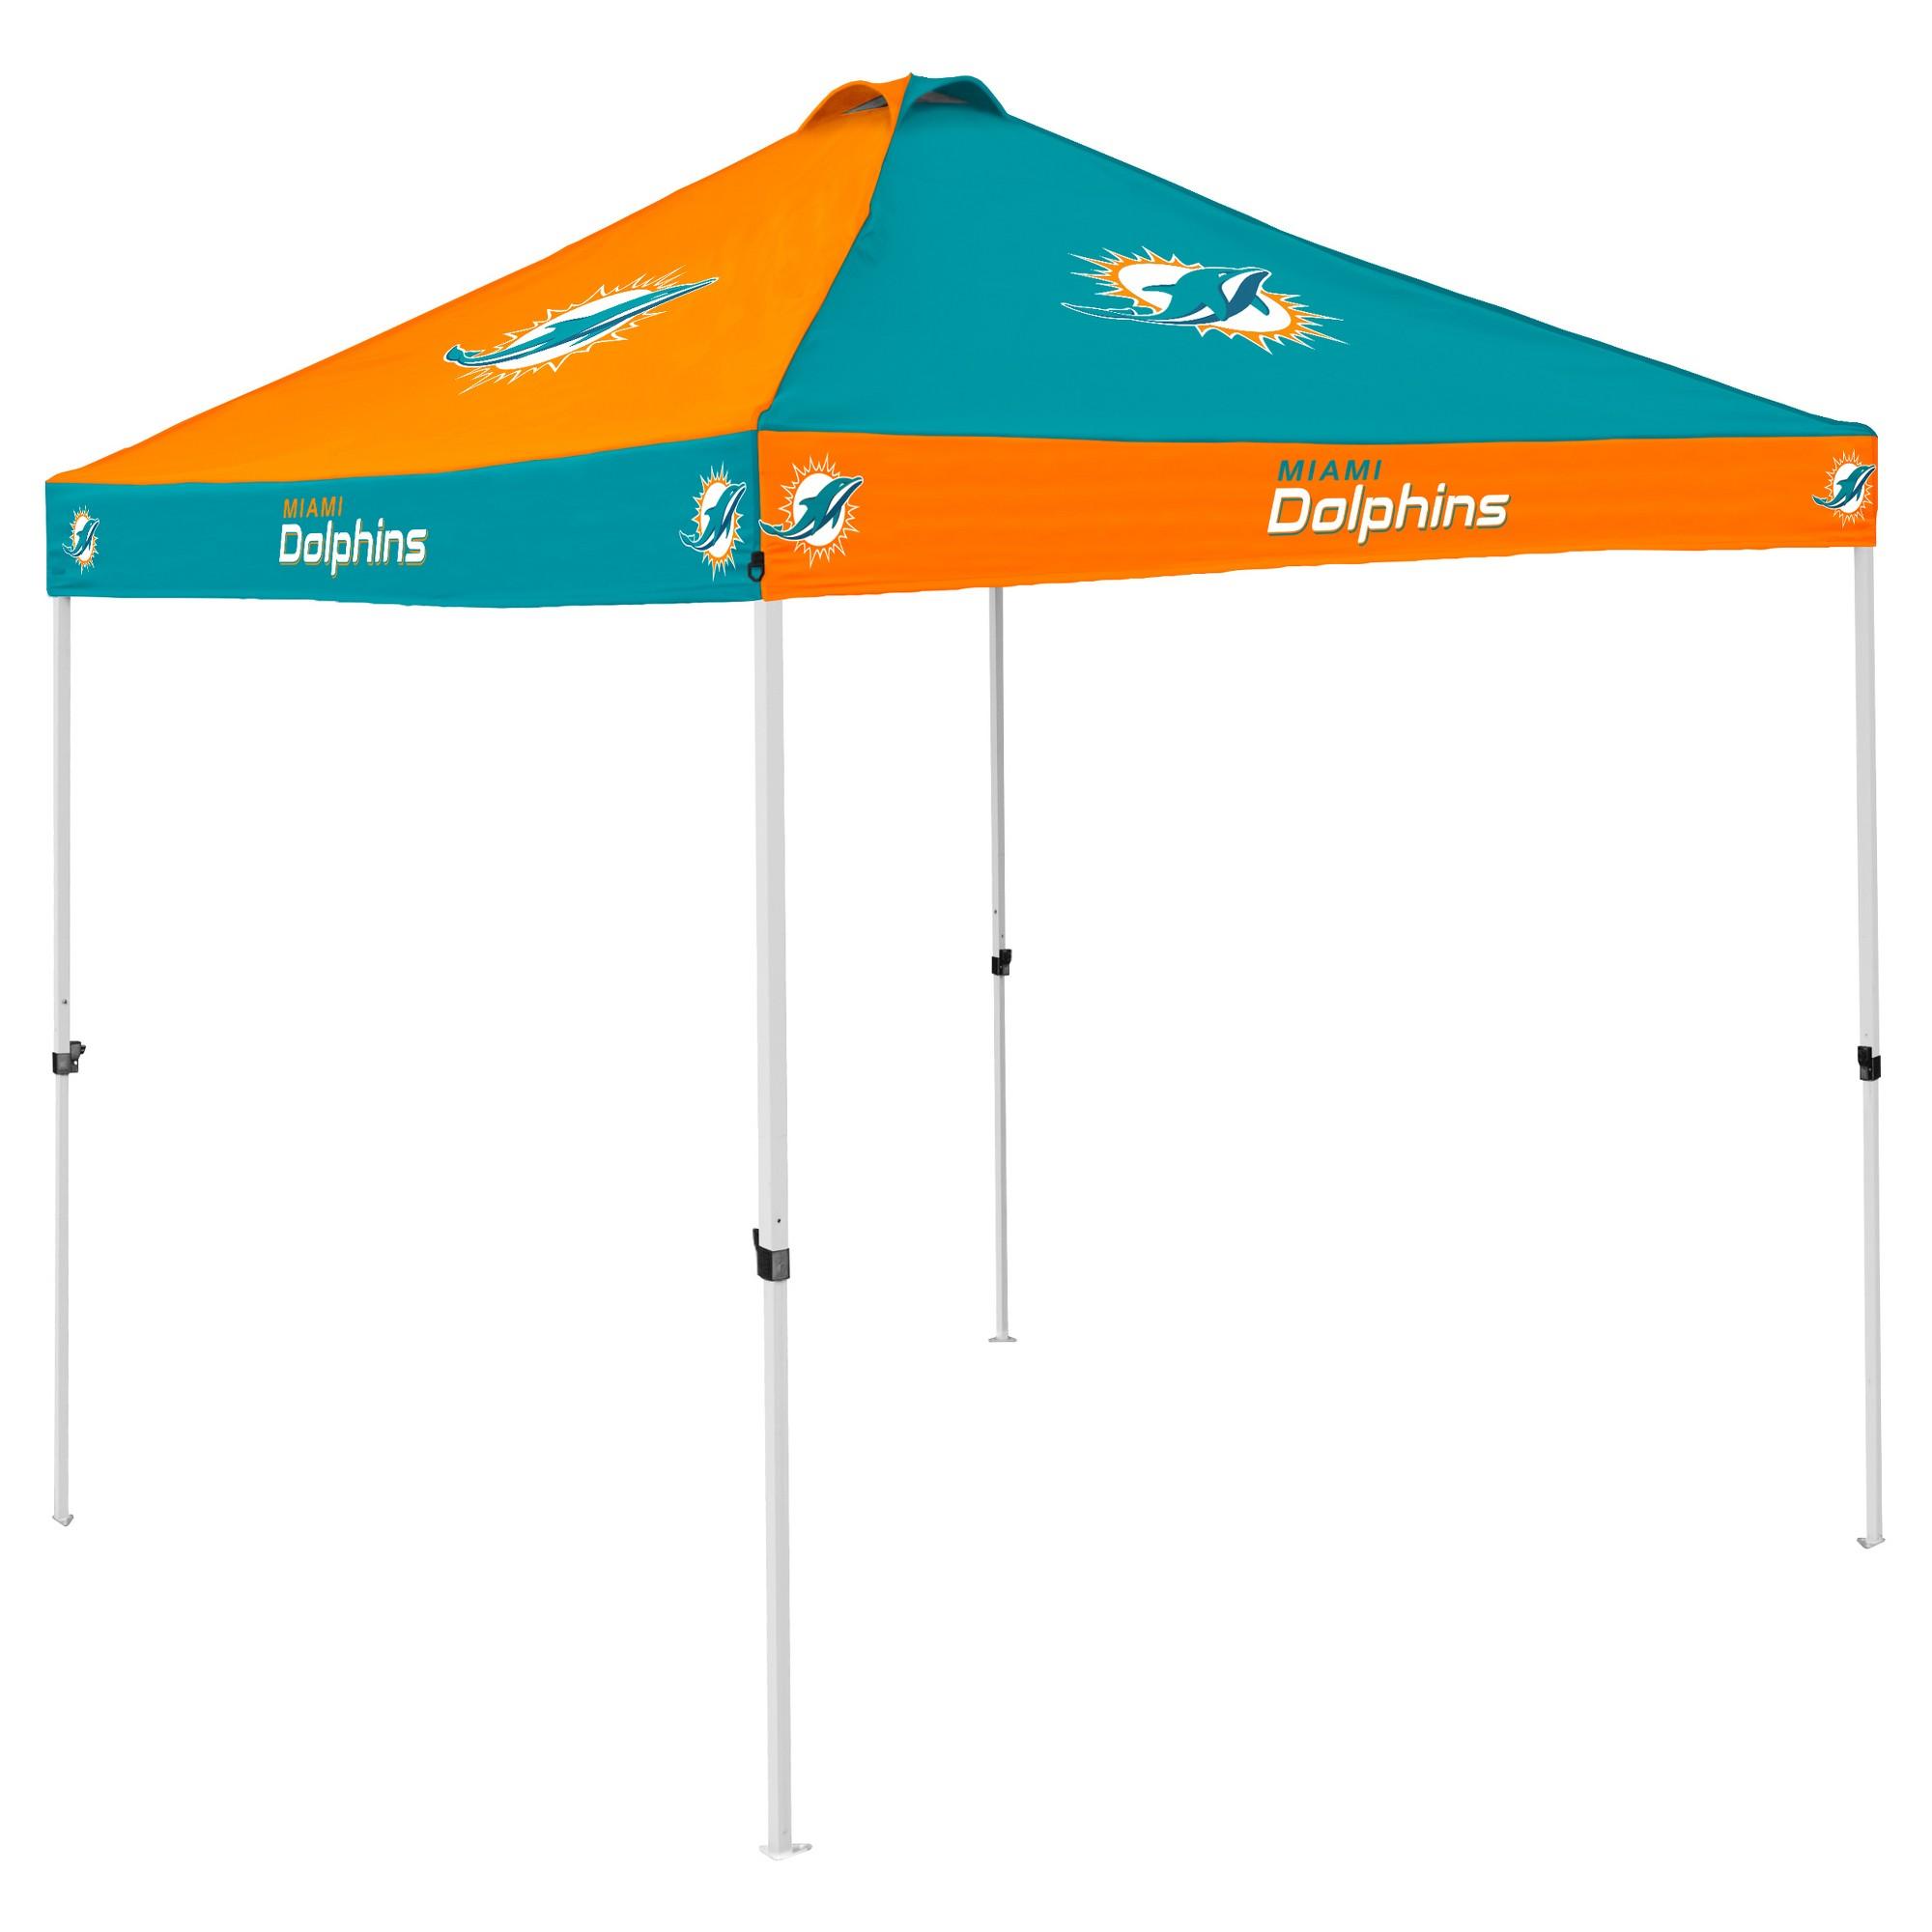 NFL Miami Dolphins 9x9u0027 Checkerboard Canopy Tent  sc 1 st  Pinterest & NFL Miami Dolphins 9x9u0027 Checkerboard Canopy Tent   Nfl miami ...